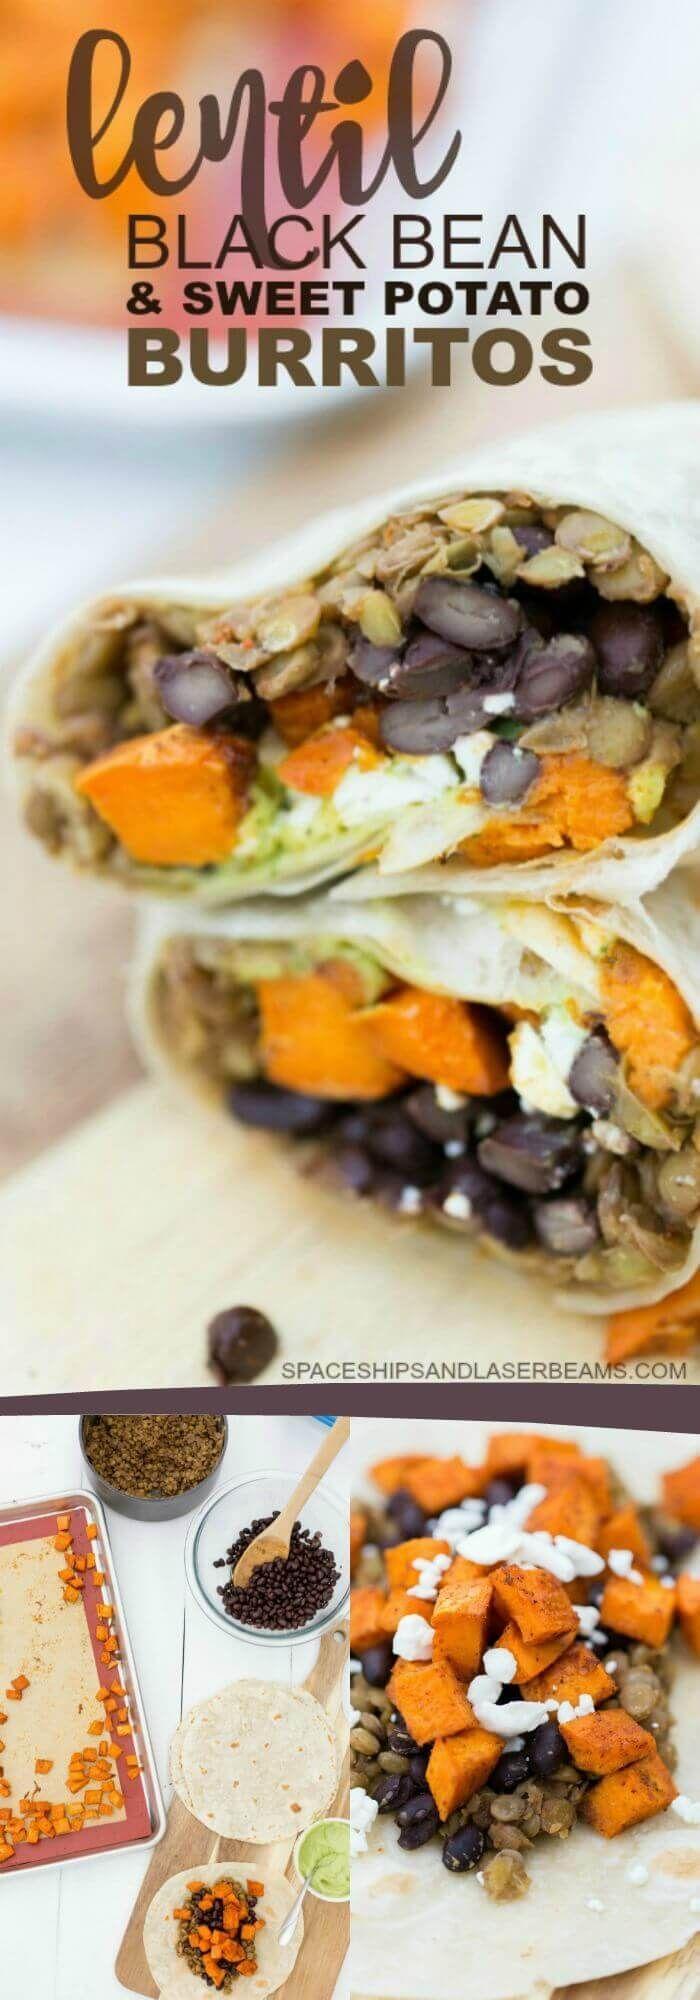 Lentil, Black Bean and Sweet Potato Burrito Recipe - Fantastic Vegetarian Burrito Option via @spaceshipslb #lovepulses #ad